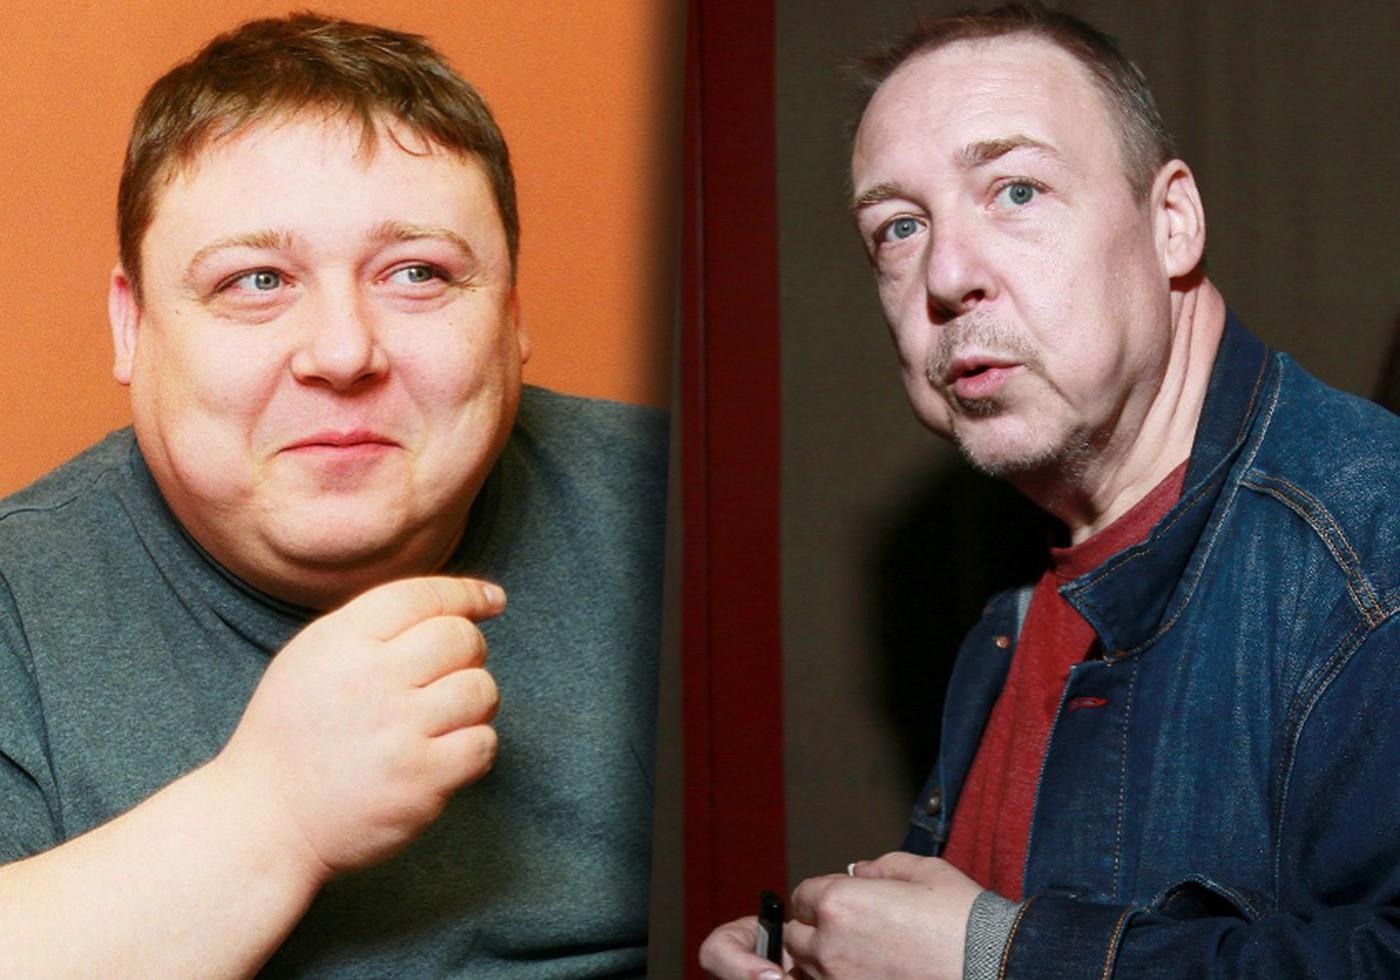 Похудевший актер Семчев